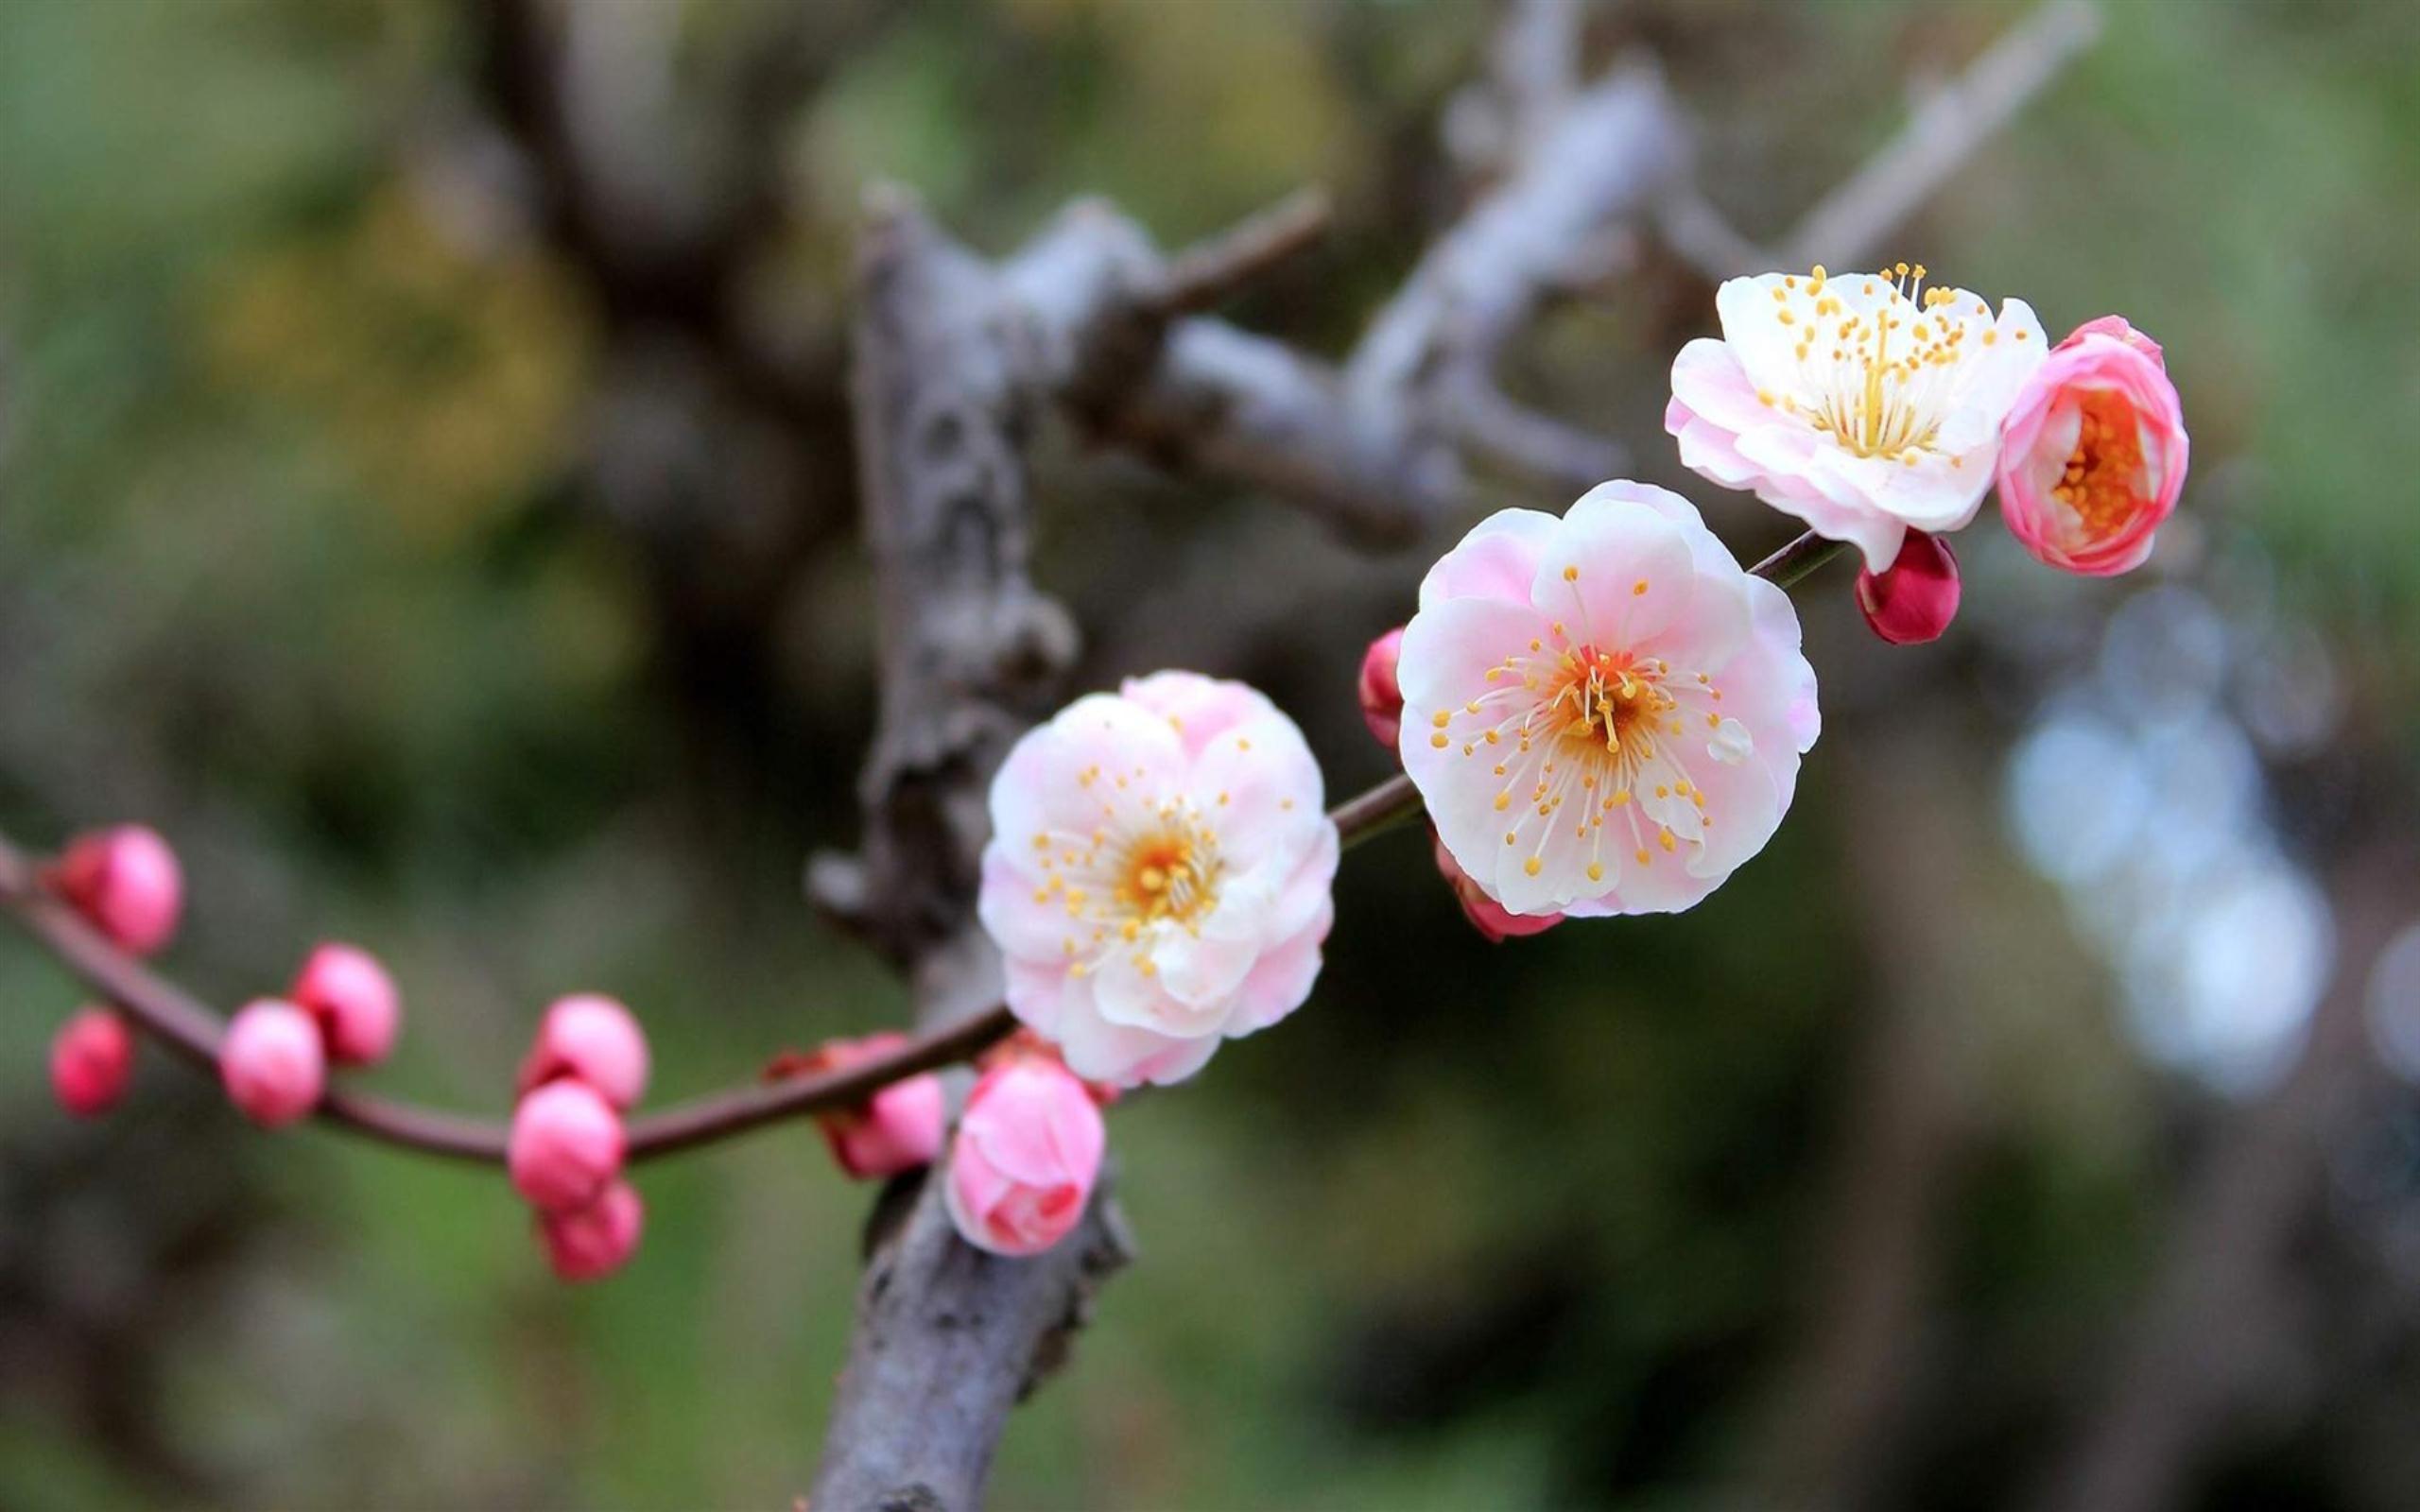 Blooming-Apple-Tree-wallpaper-wpc9003005